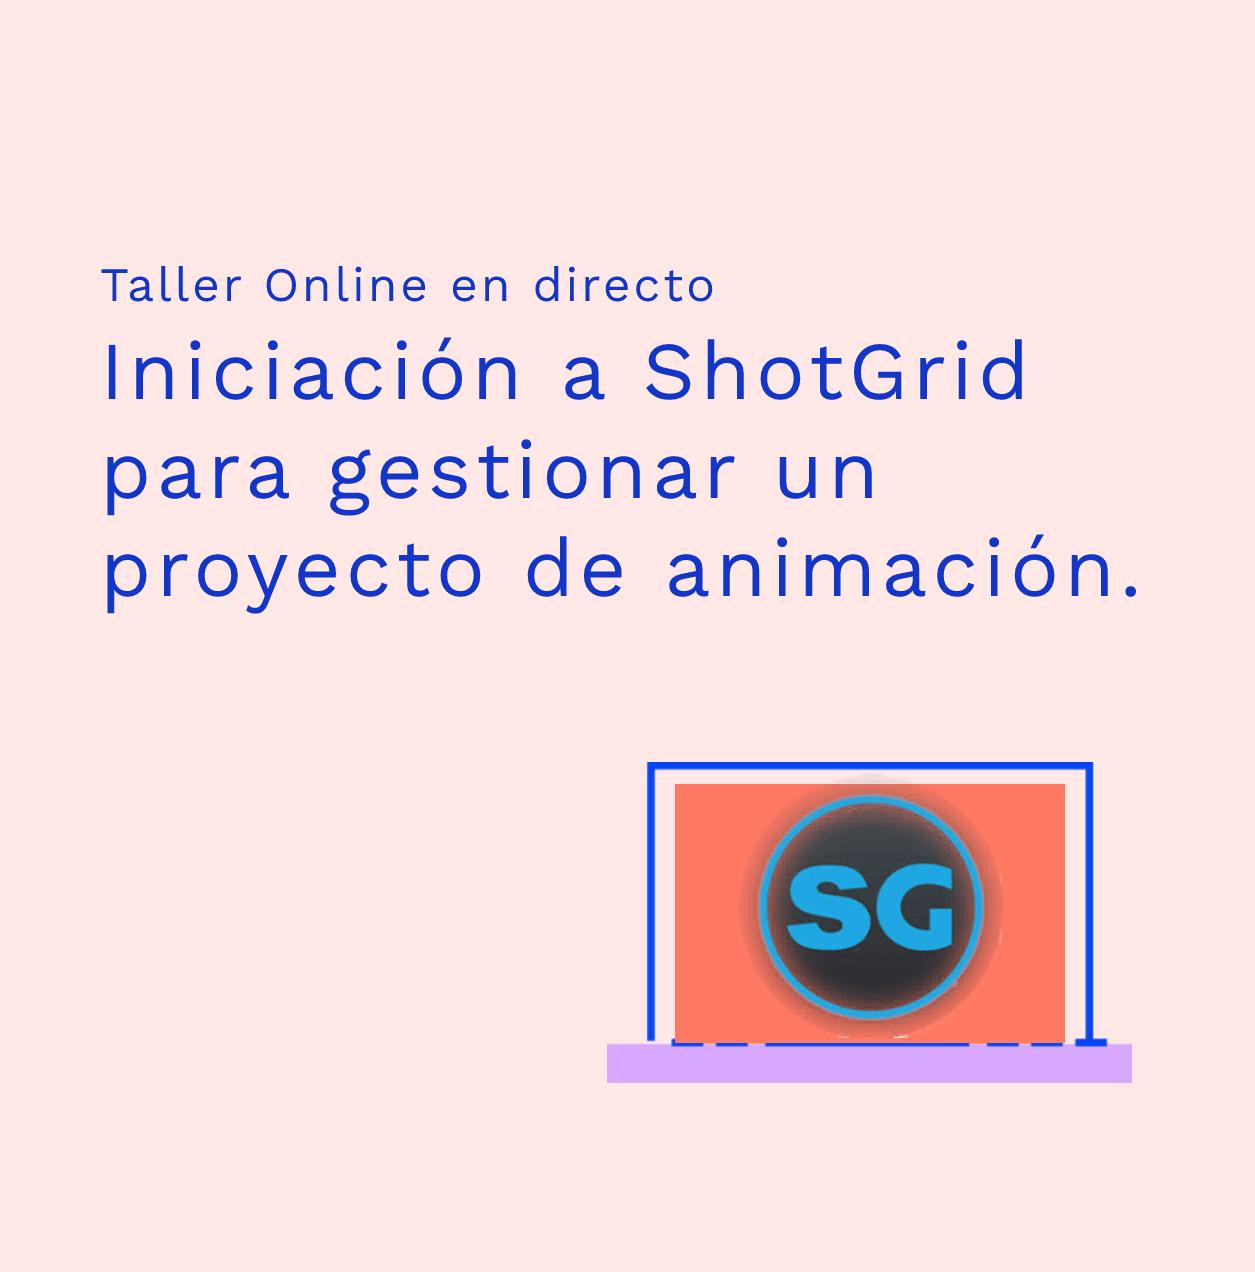 Iniciación a Shotgun para gestionar un proyecto de animación – Curso práctico ONLINE en directo